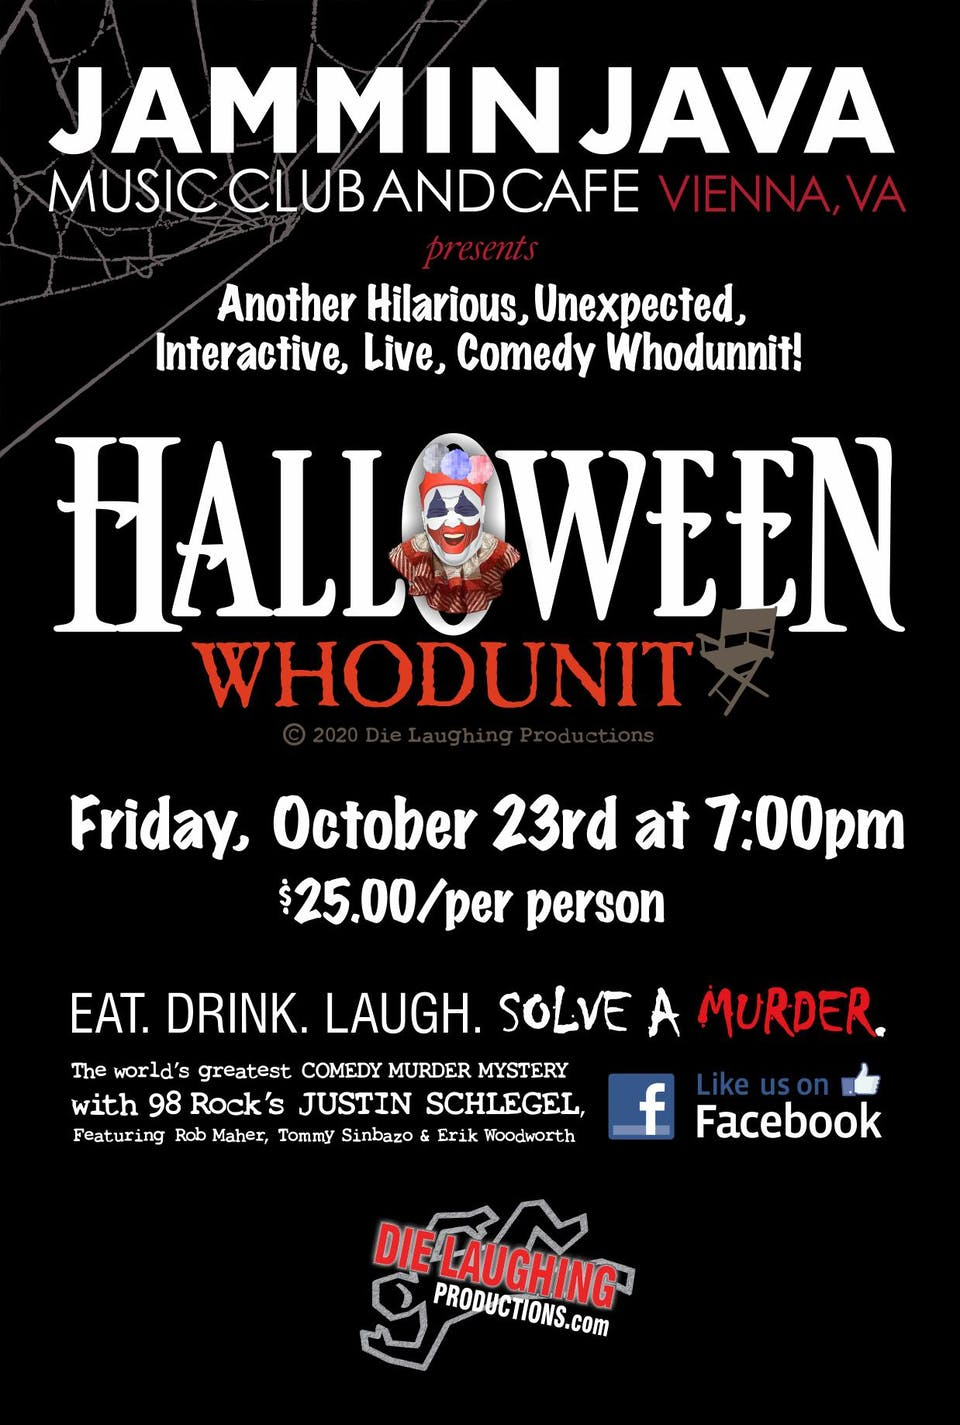 POSTPONED | Die Laughing Productions Presents Halloween Whodunit